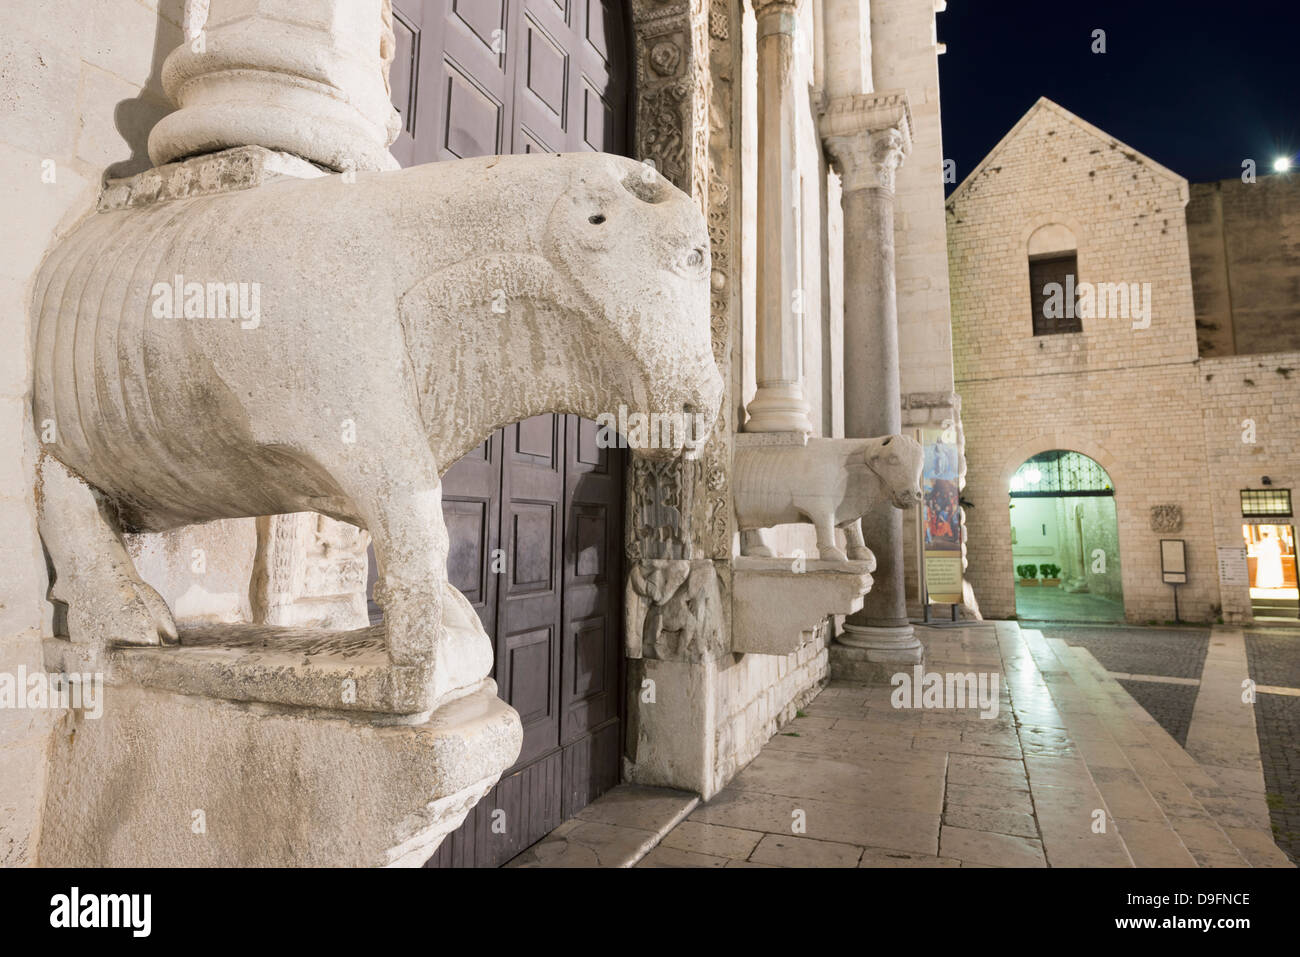 Sculptures on San Nicola Basilica, Bari, Puglia, Italy - Stock Image